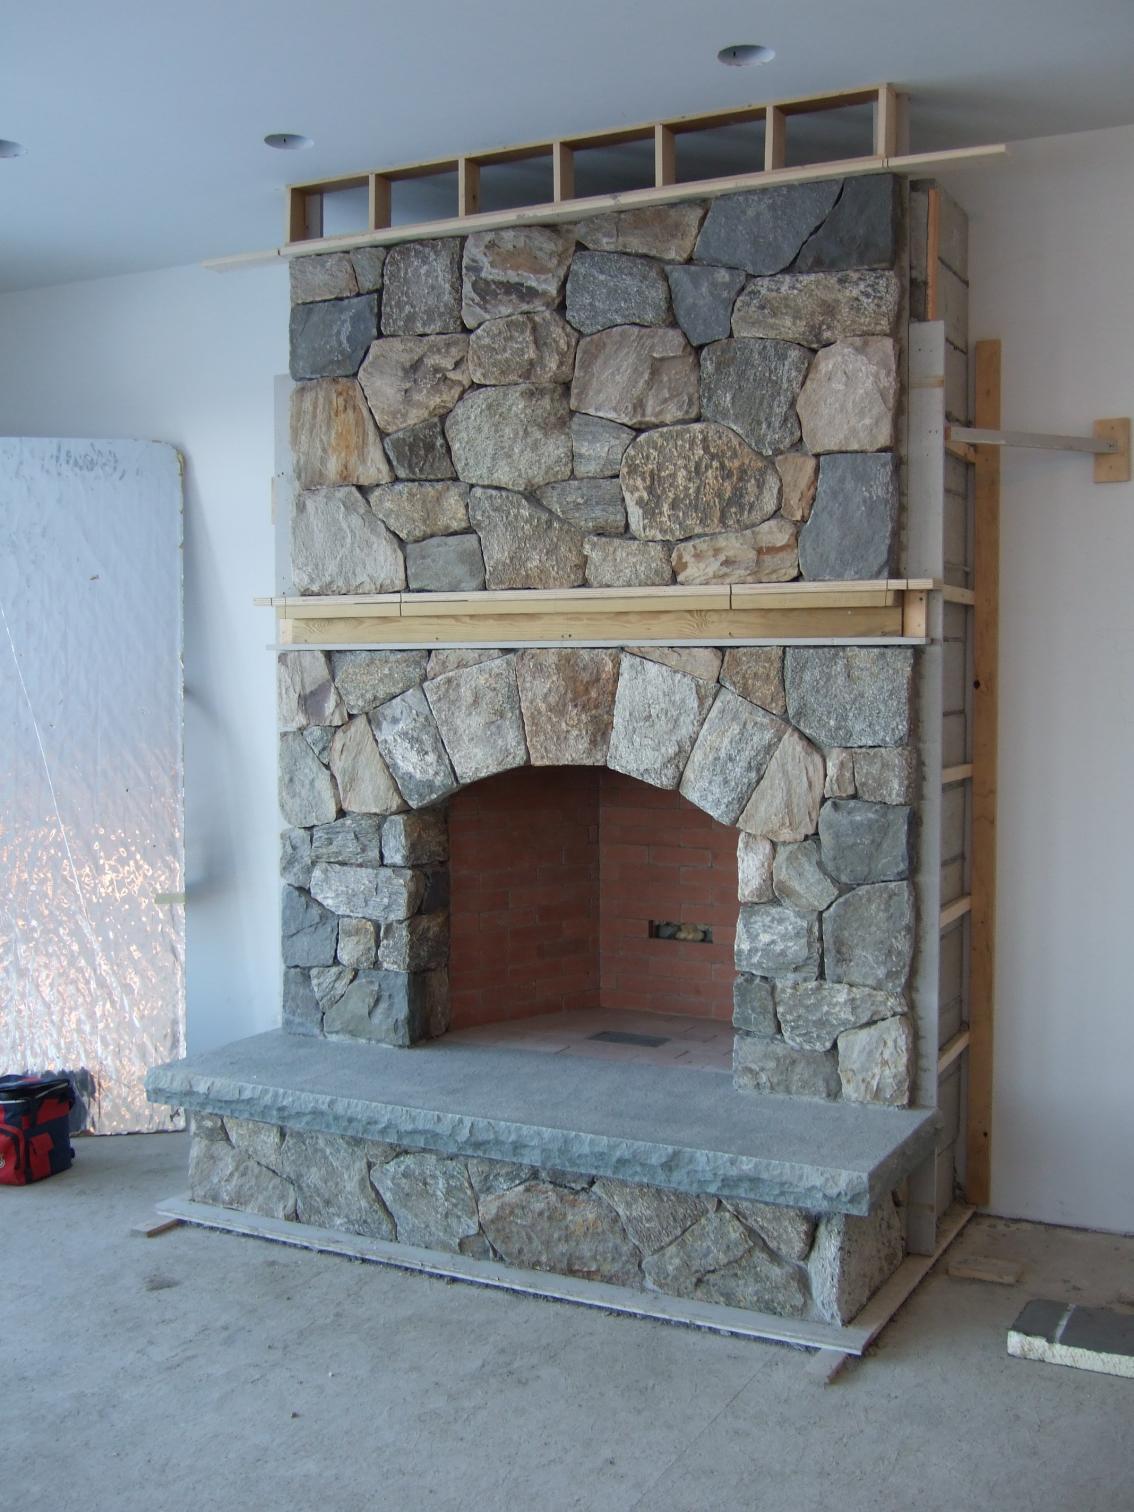 Isokern Fireplace And Chimney Systems Masonry